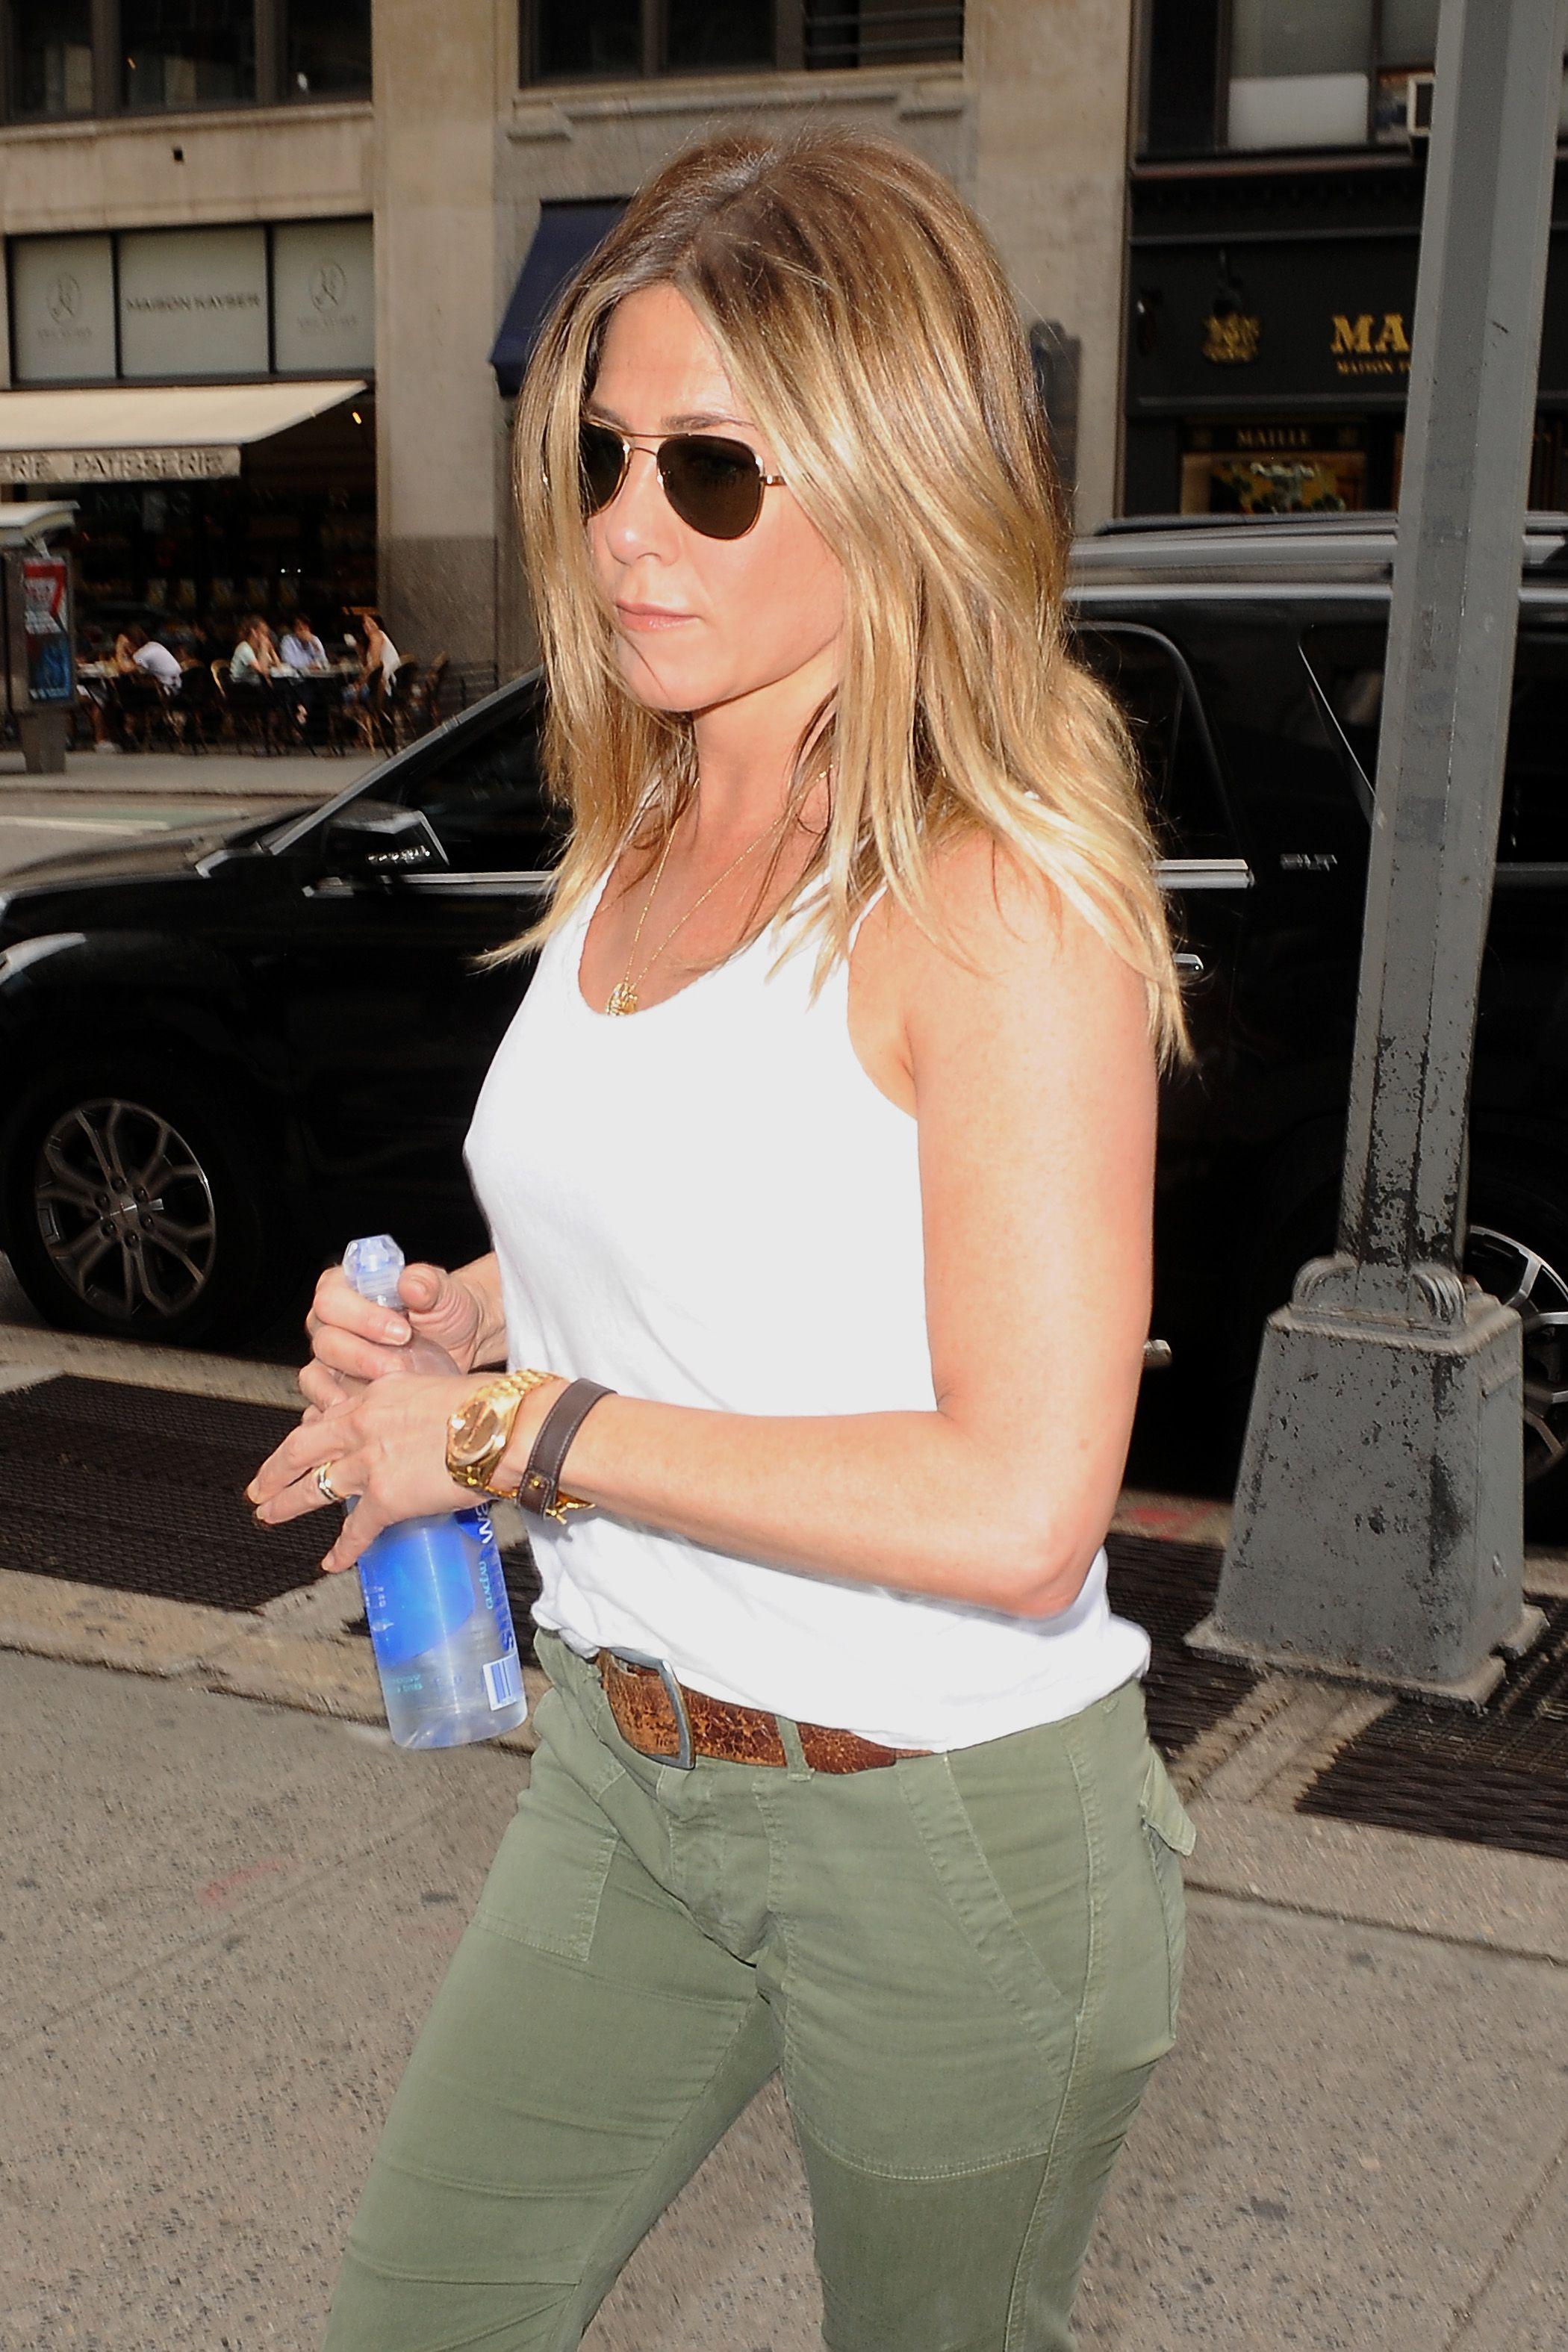 Jennifer Aniston se desnuda en sesión fotográfica   Emol Fotos